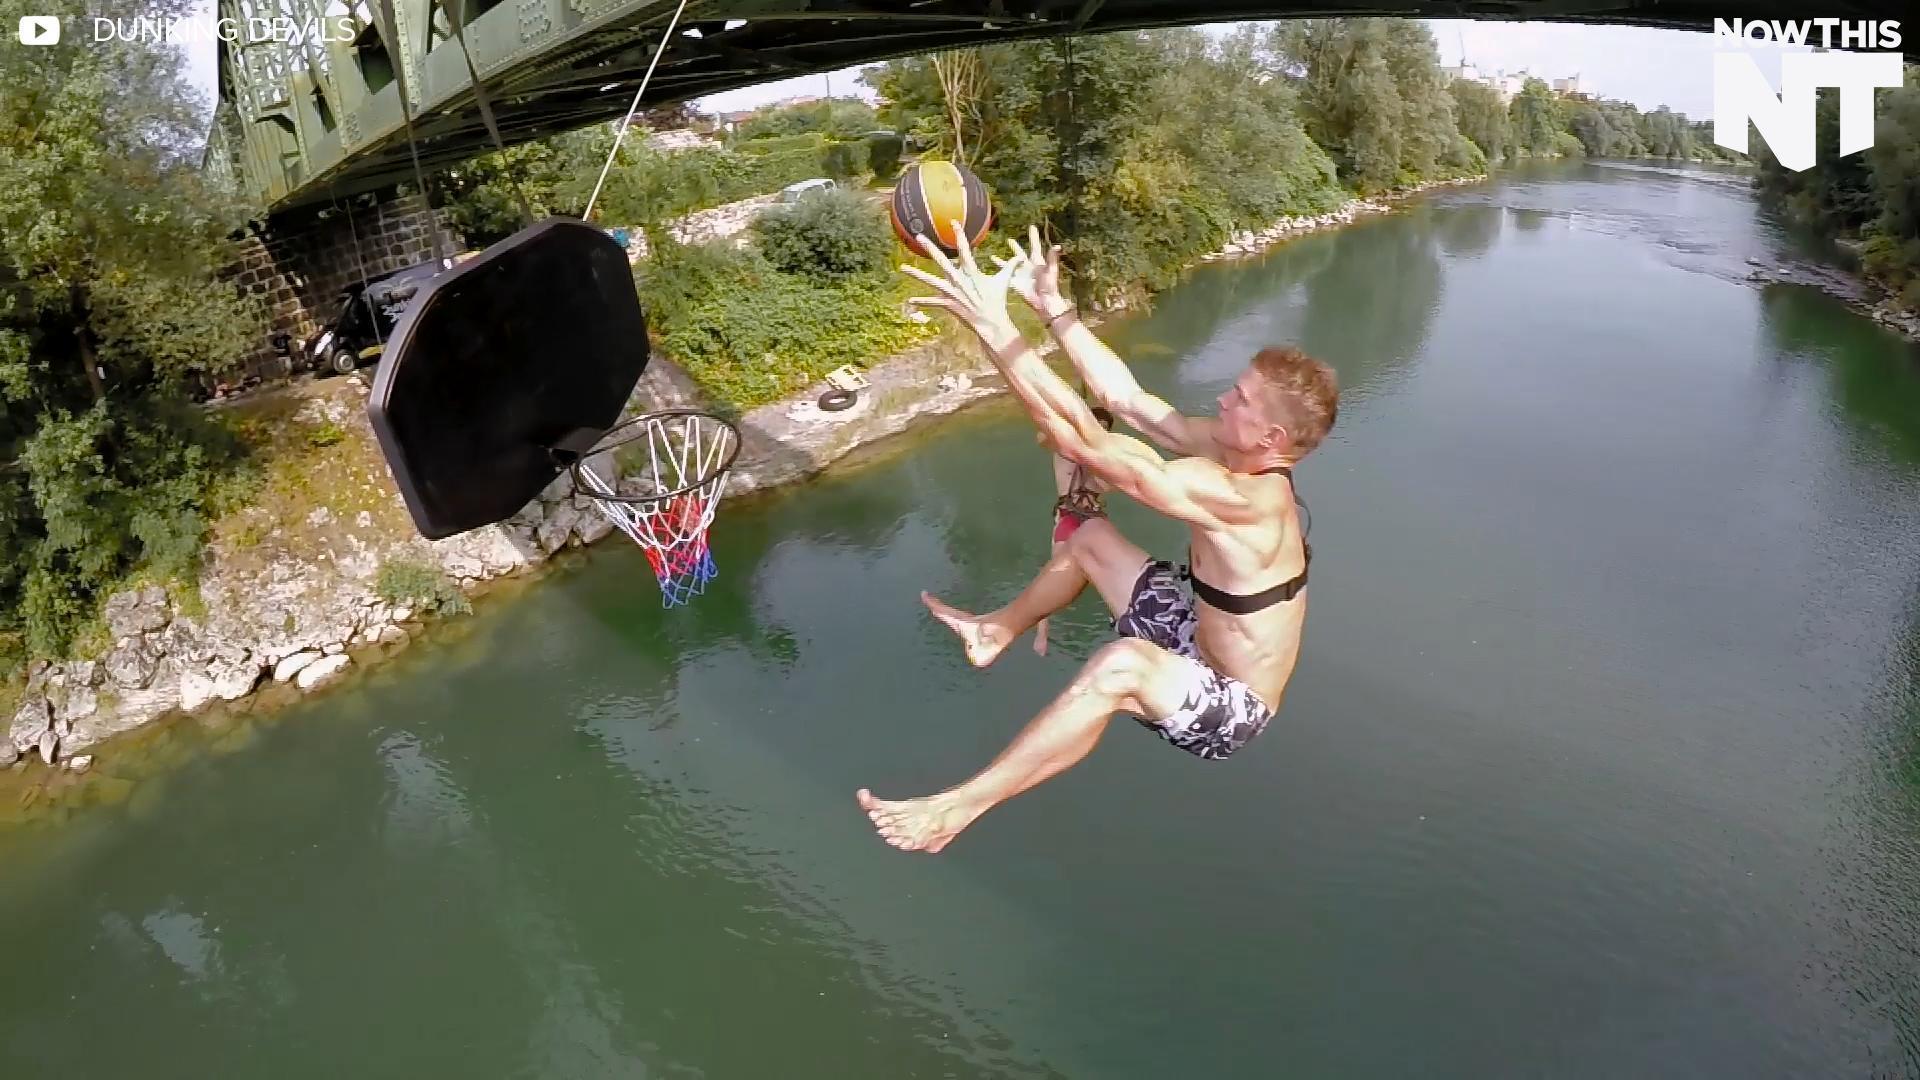 Acrobatic Basketball Team Does Mind-Bending Stunts